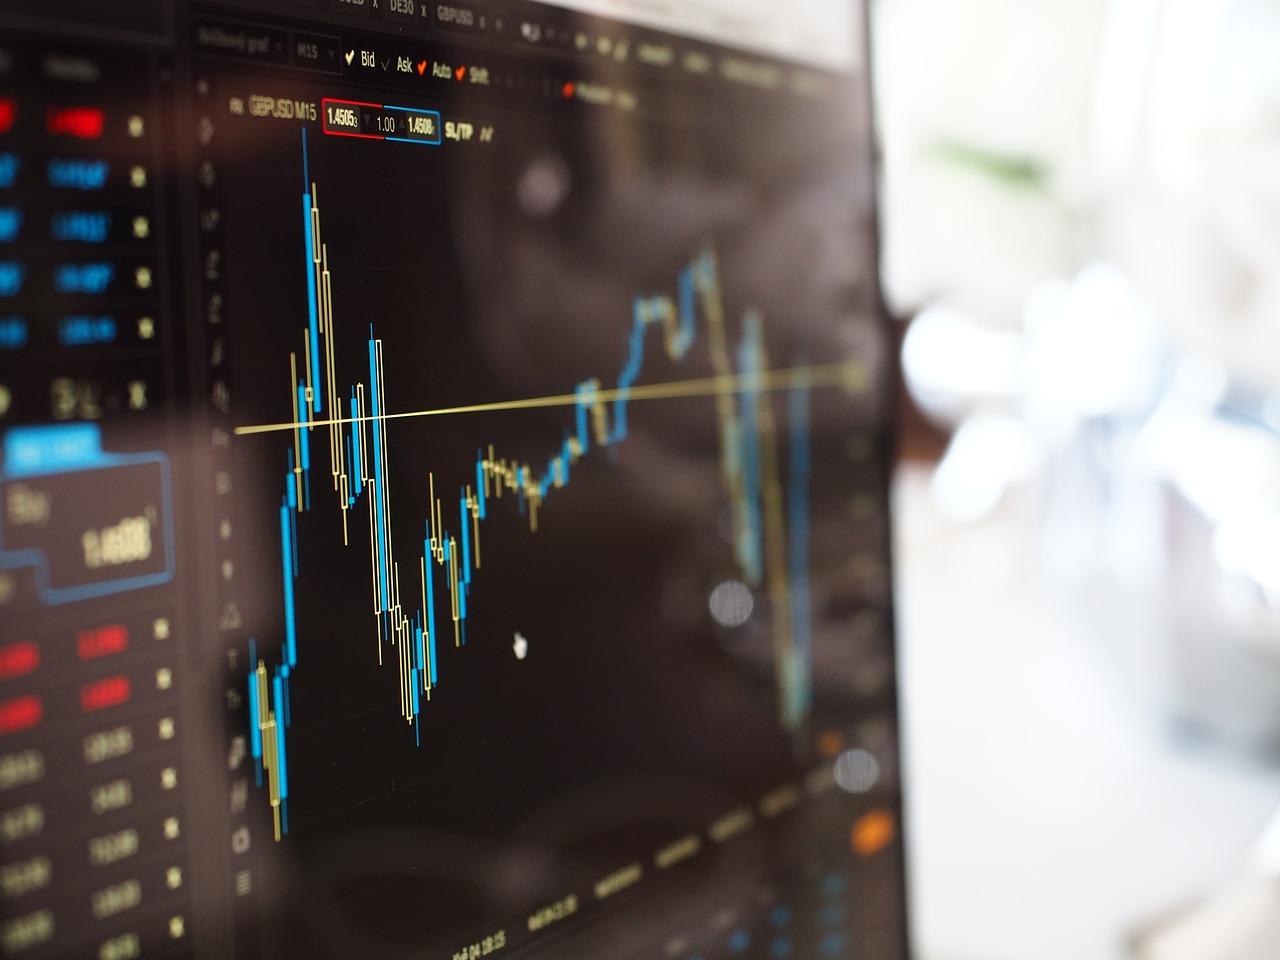 Investor Alert: CannTrust Initial Public Offering Positions Investors for Potential Profit